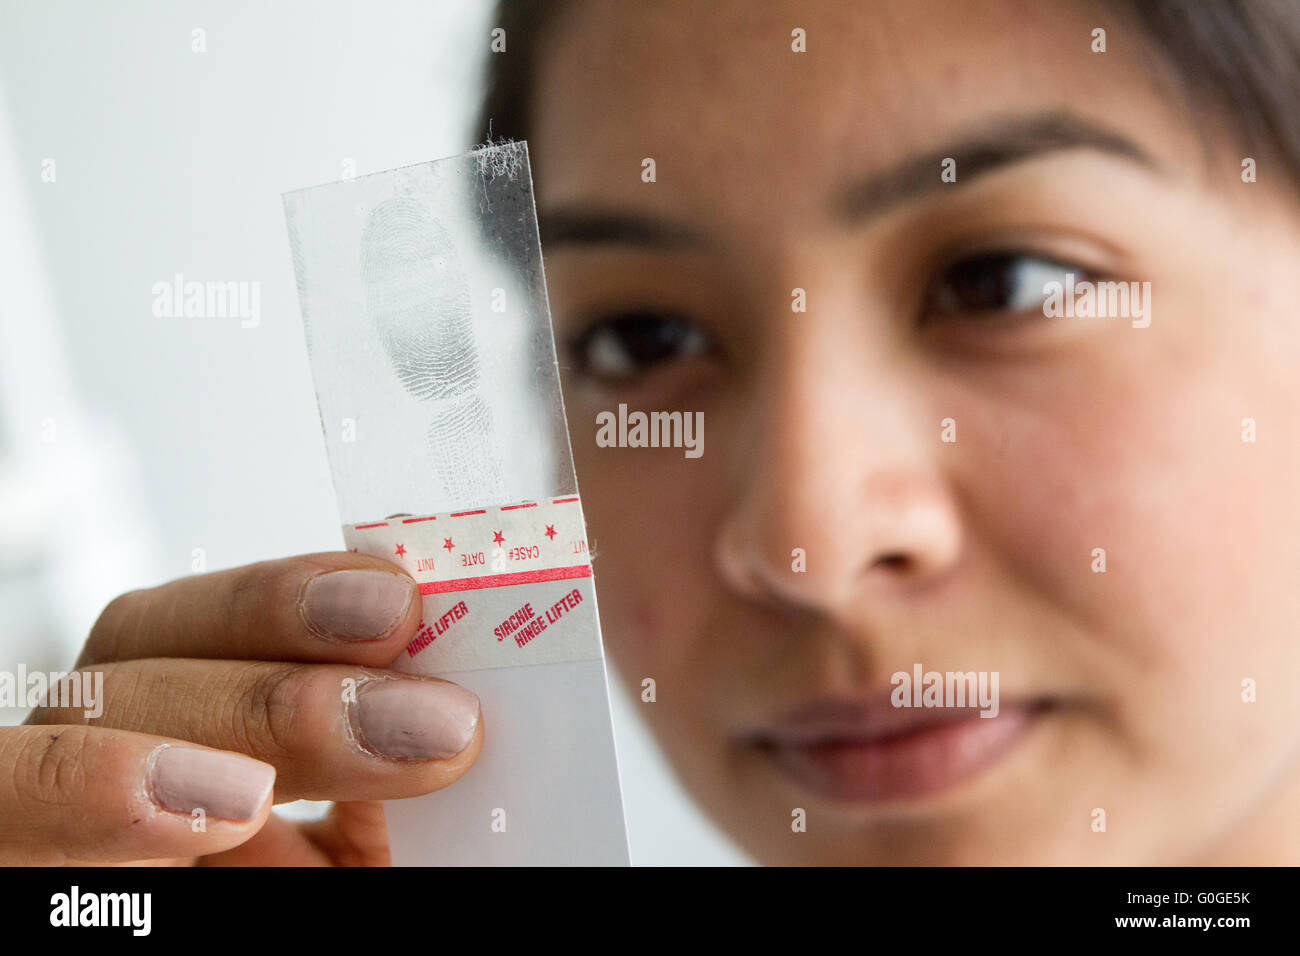 Forensic scientist examining fingerprint - Stock Image